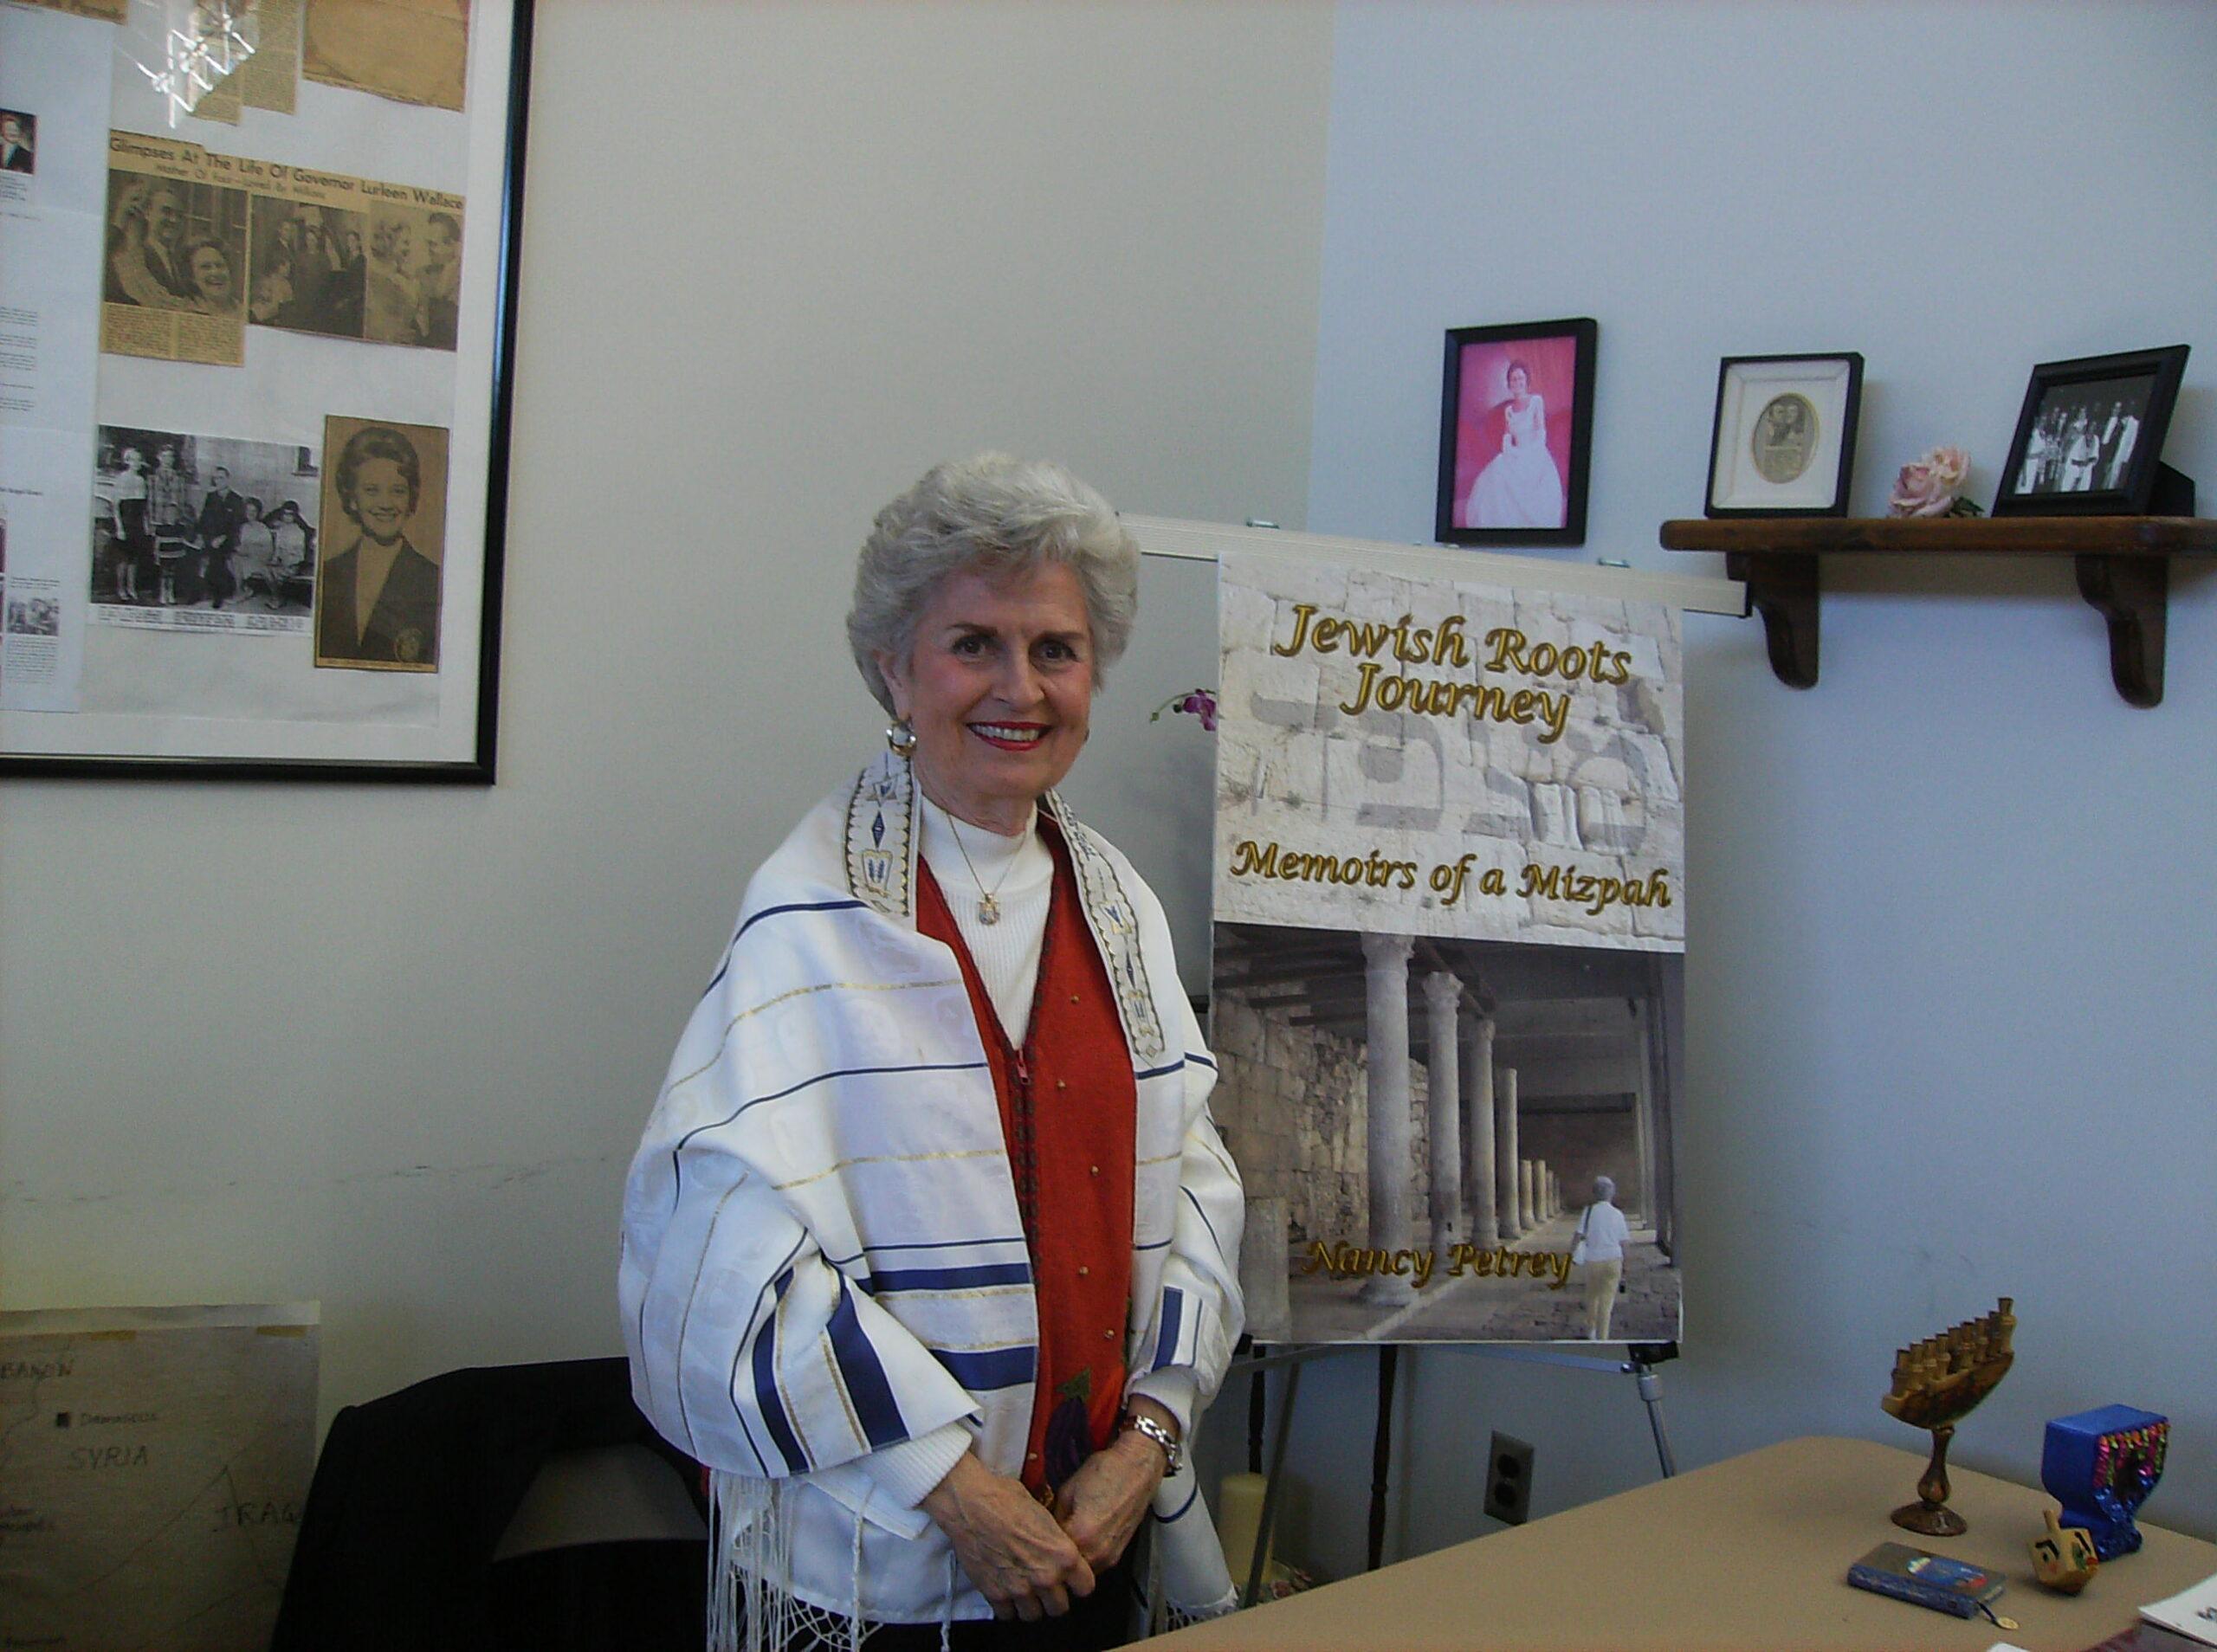 Nancy Petrey, author of Jewish Roots Journey